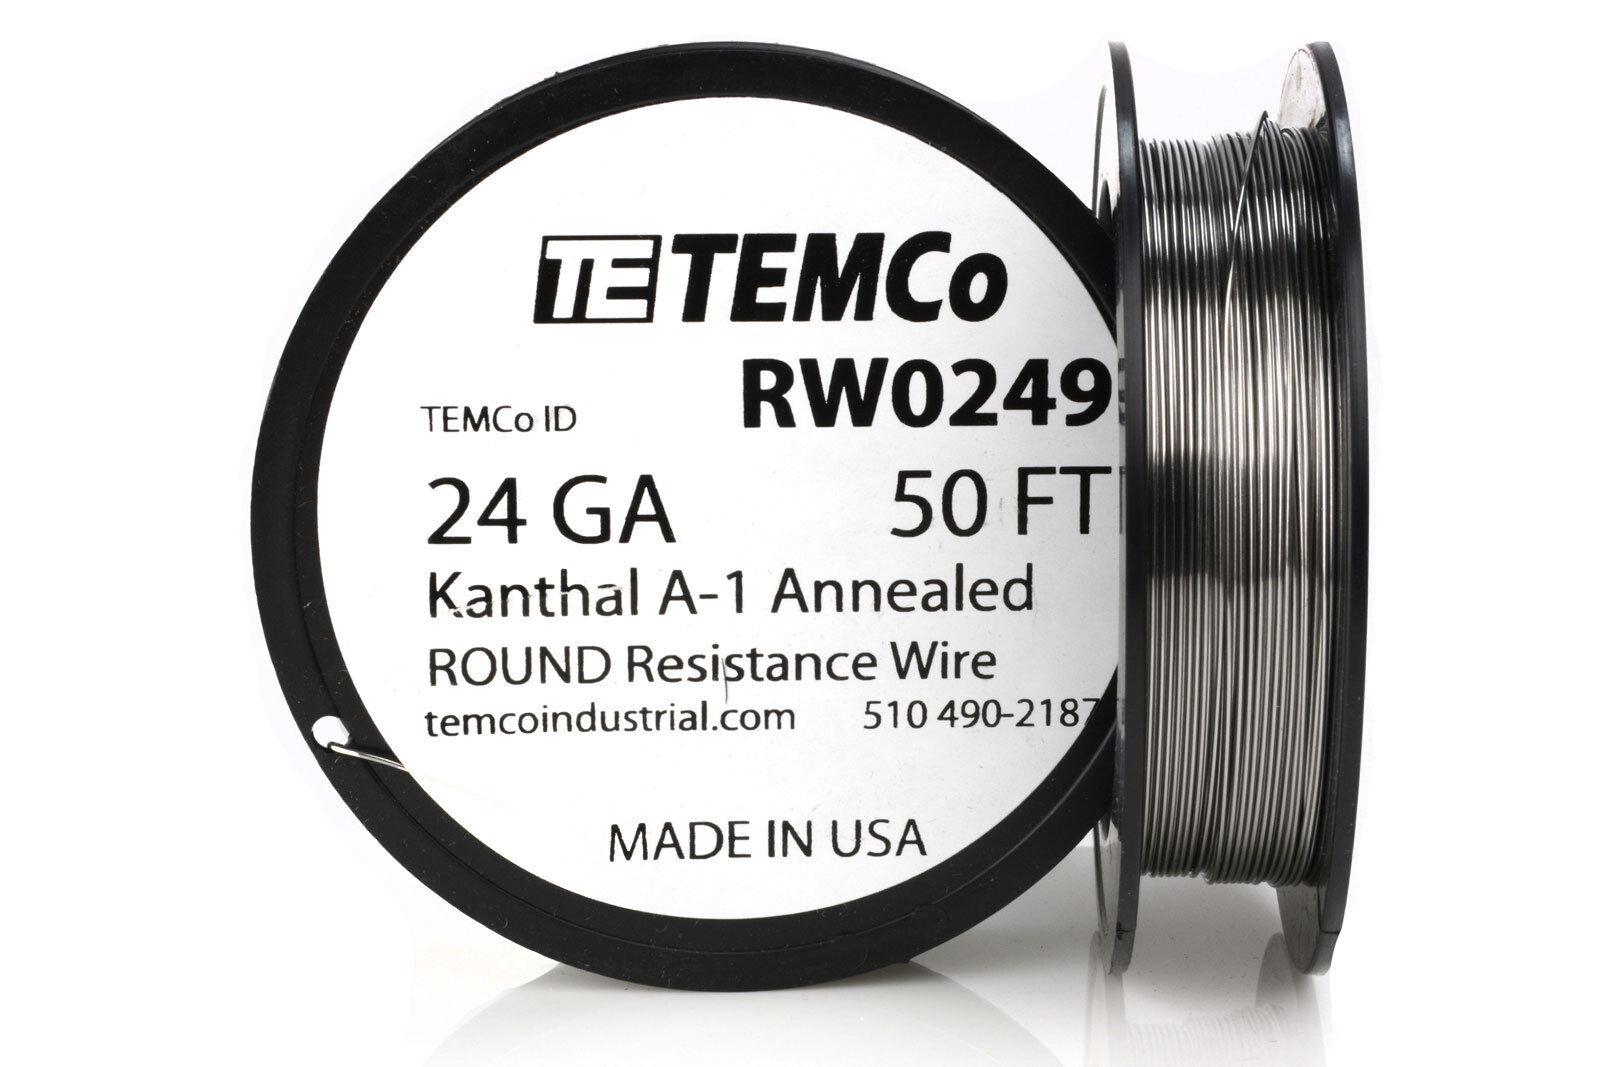 Temco Kanthal A1 Wire 24 Gauge 50 FT Resistance AWG A-1 GA | eBay